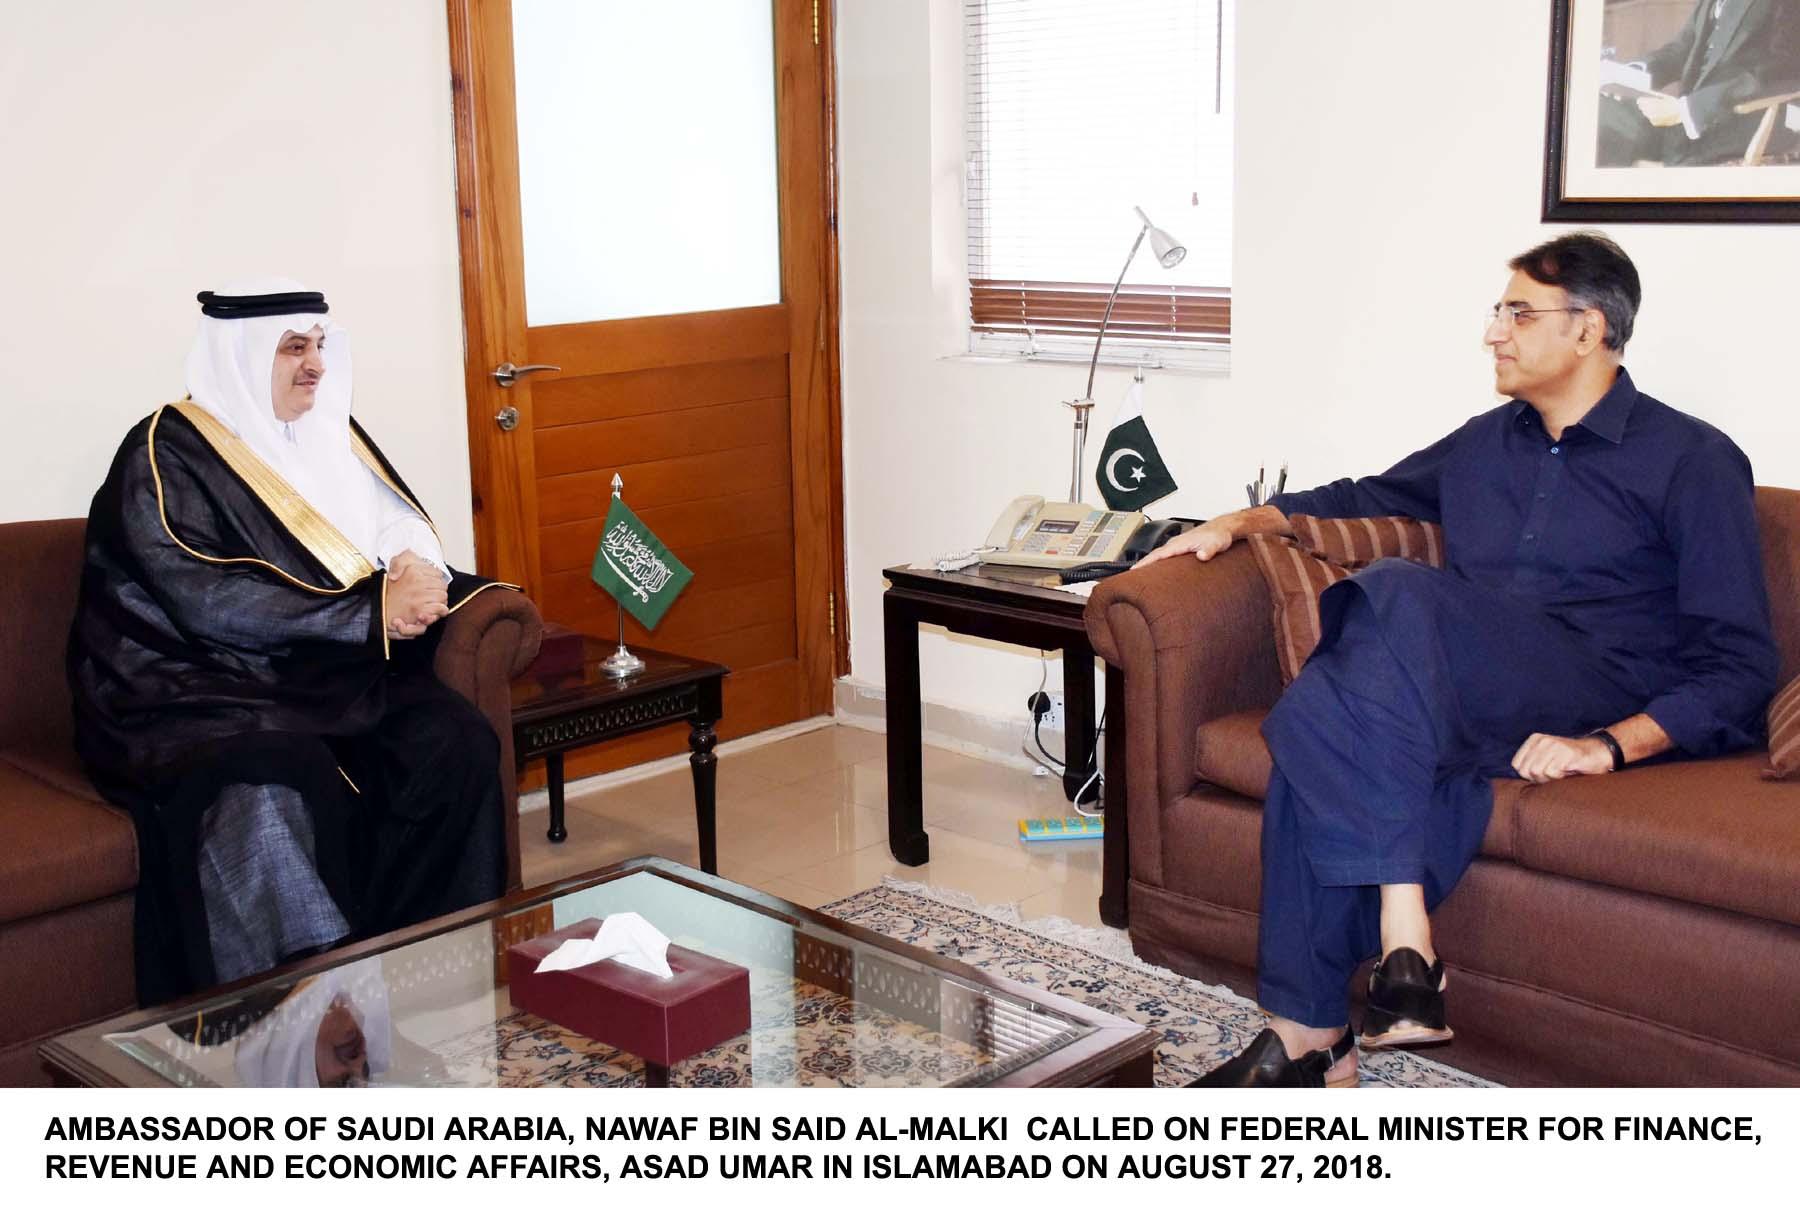 Saudi ambassador meets Federal Minister for Finance, Asad Umar